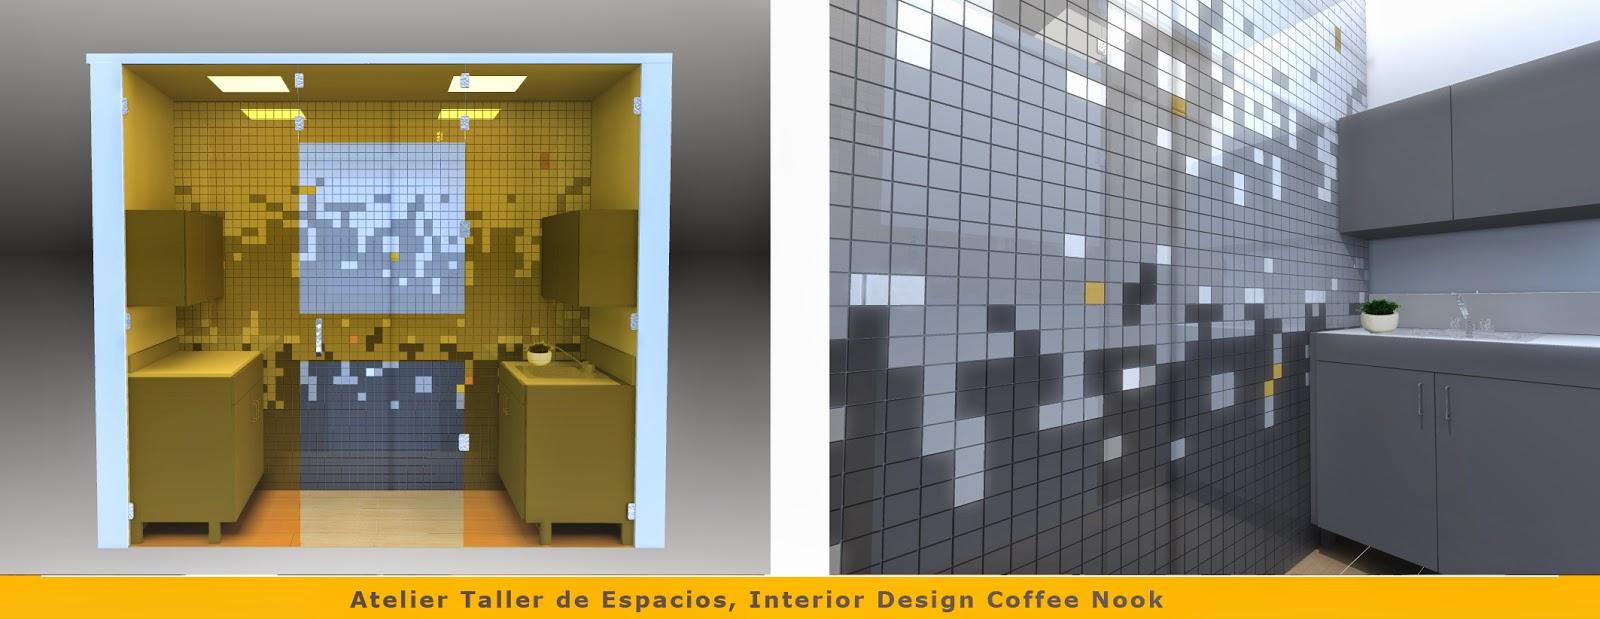 Coffee Nook, Interior design, diseño de Interiores guatemala, Atelier Taller de Espcacios